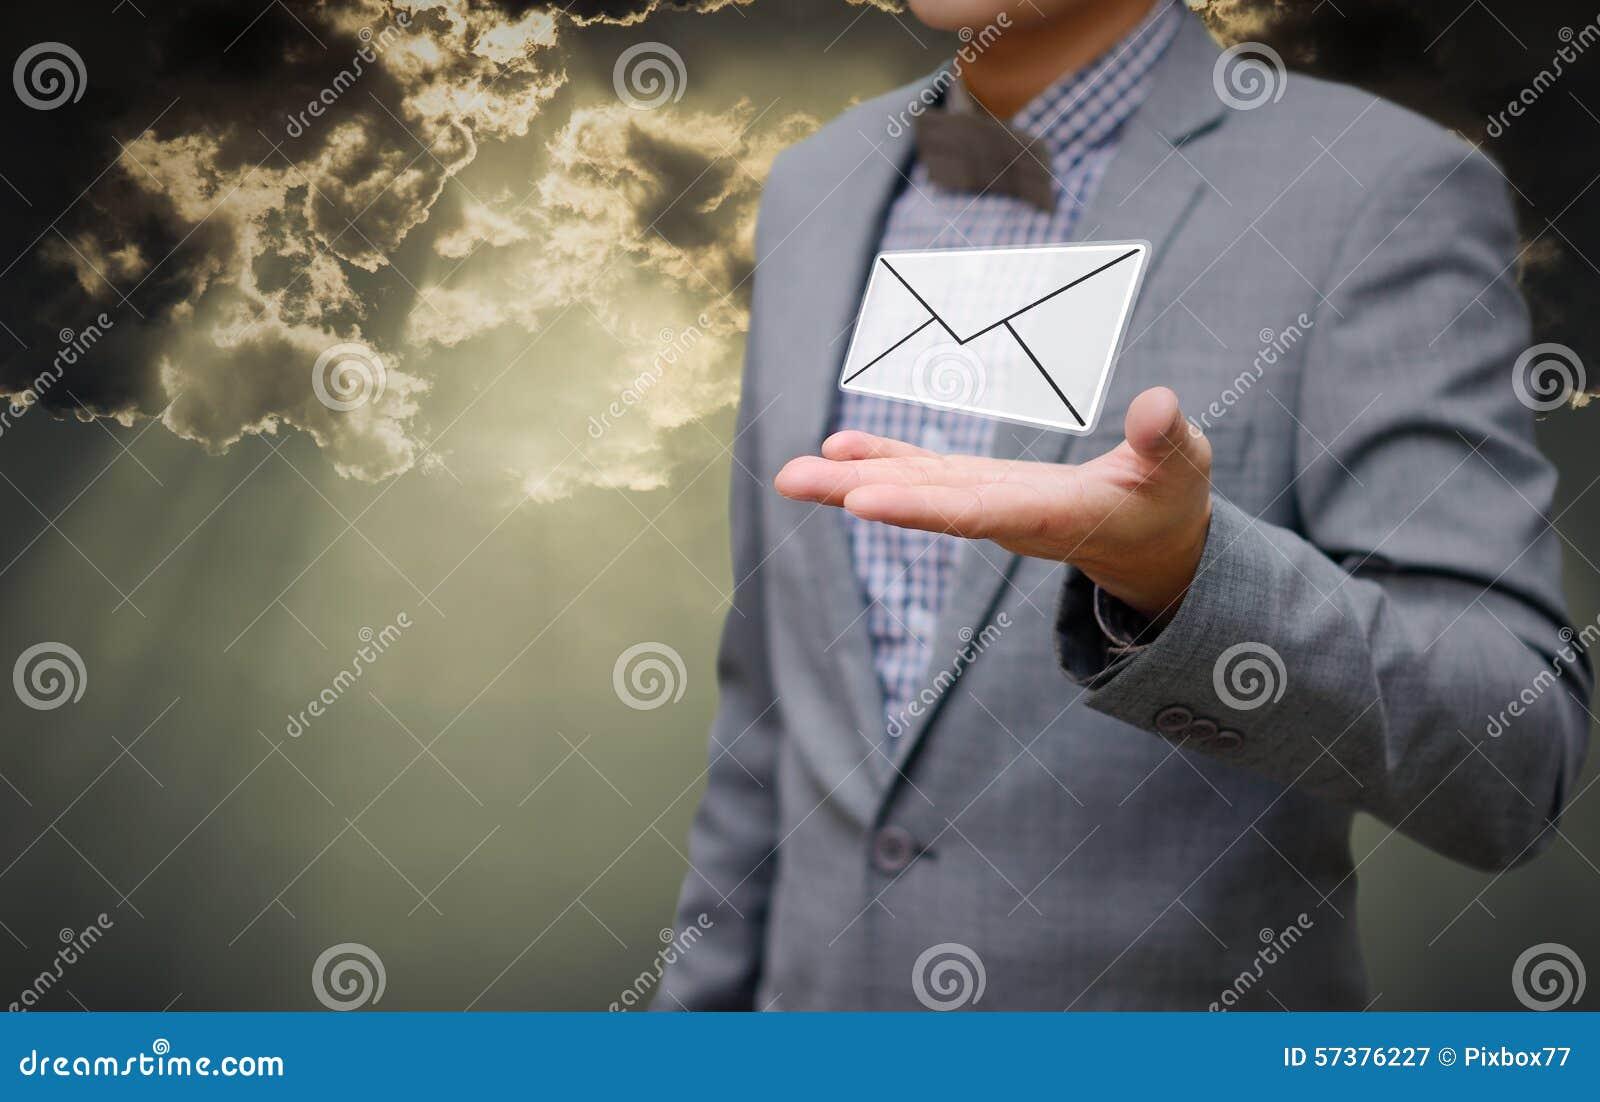 De zakenman krijgt e-mail met glanzende hemel in hand